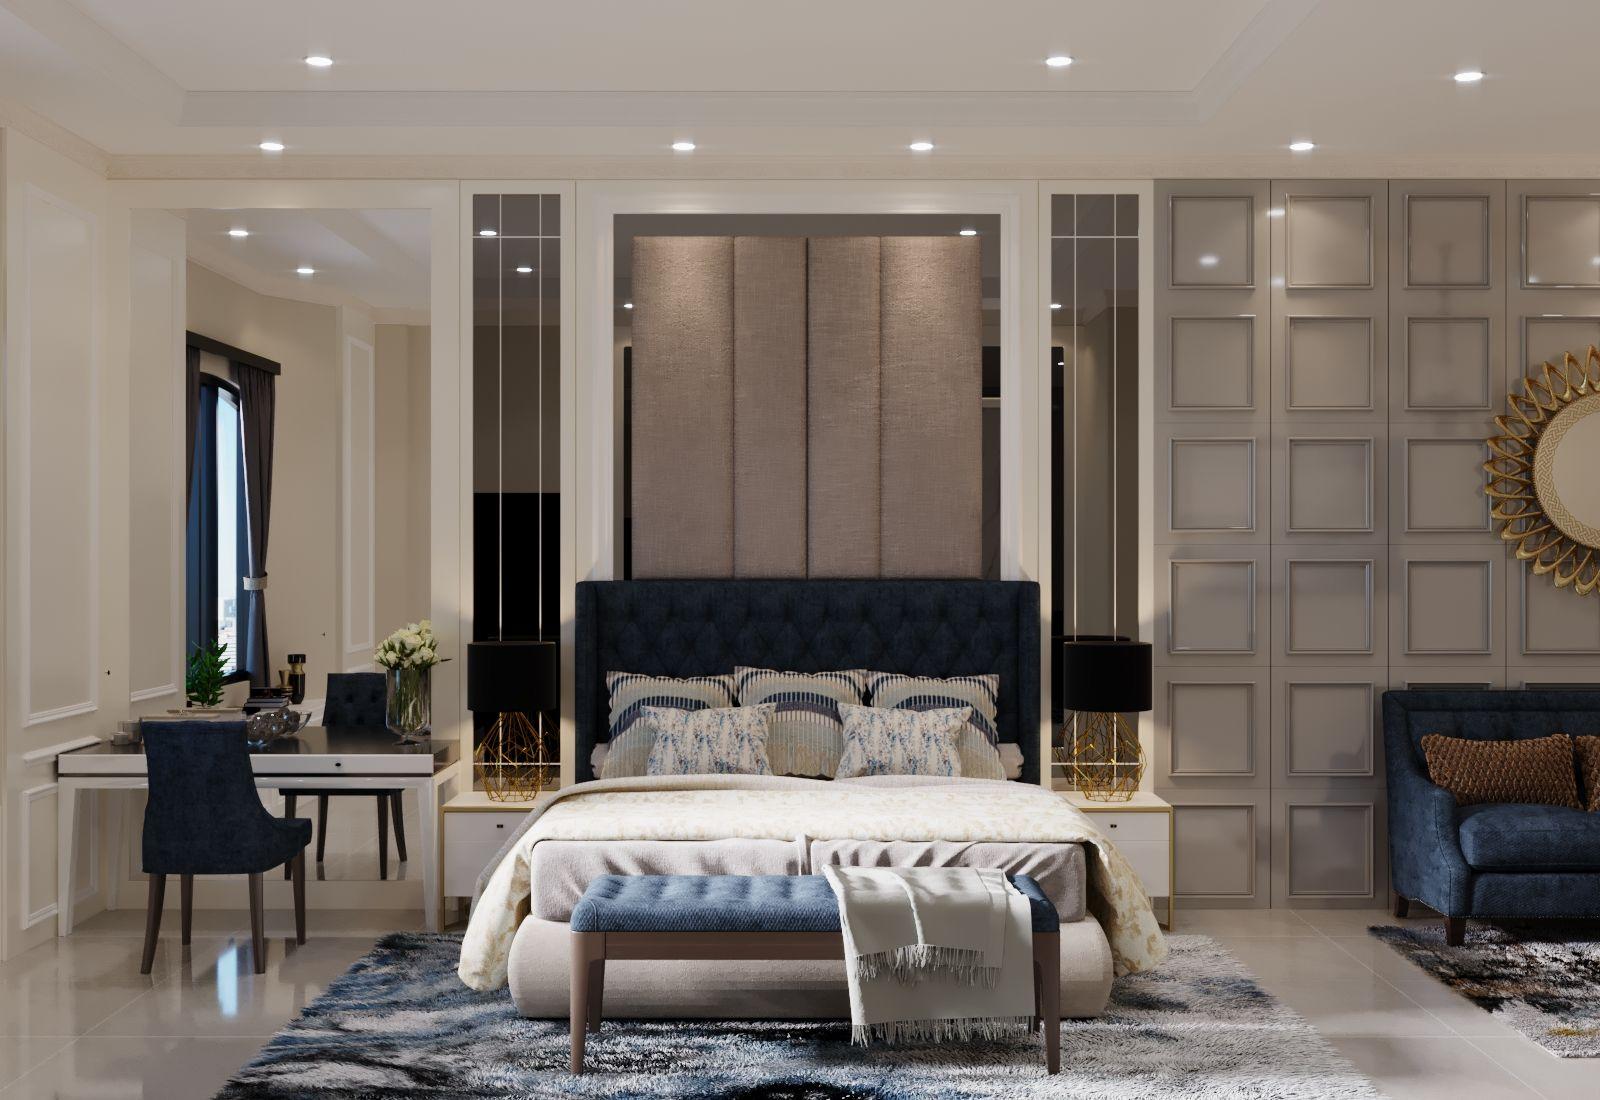 Bedroom American Classic Design American bedrooms furniture classic